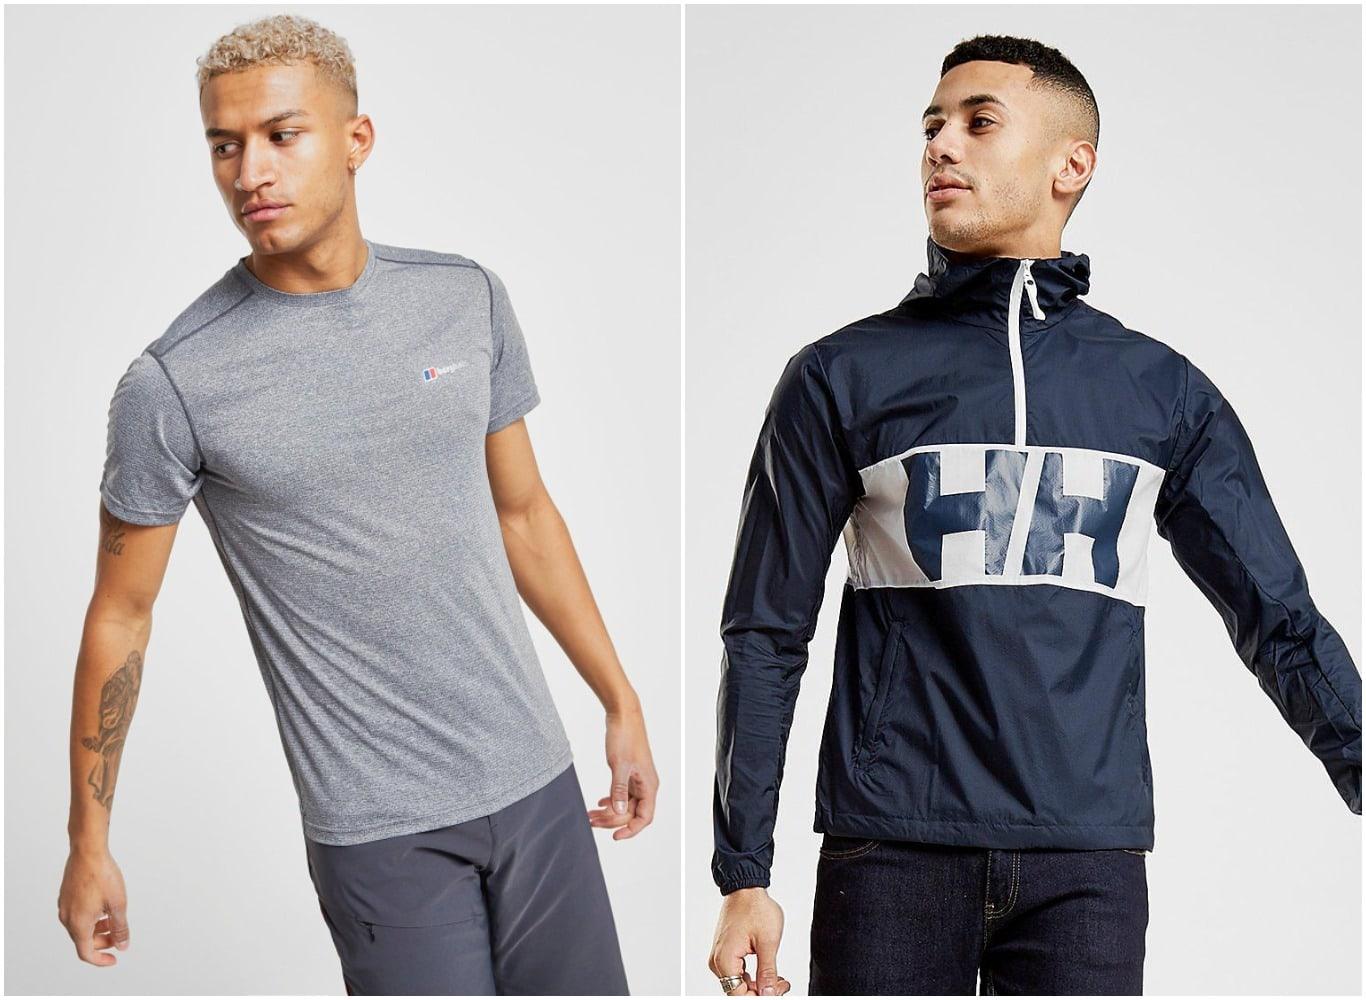 Camiseta de Berghaus y chaqueta de Helly Hansen para hombre